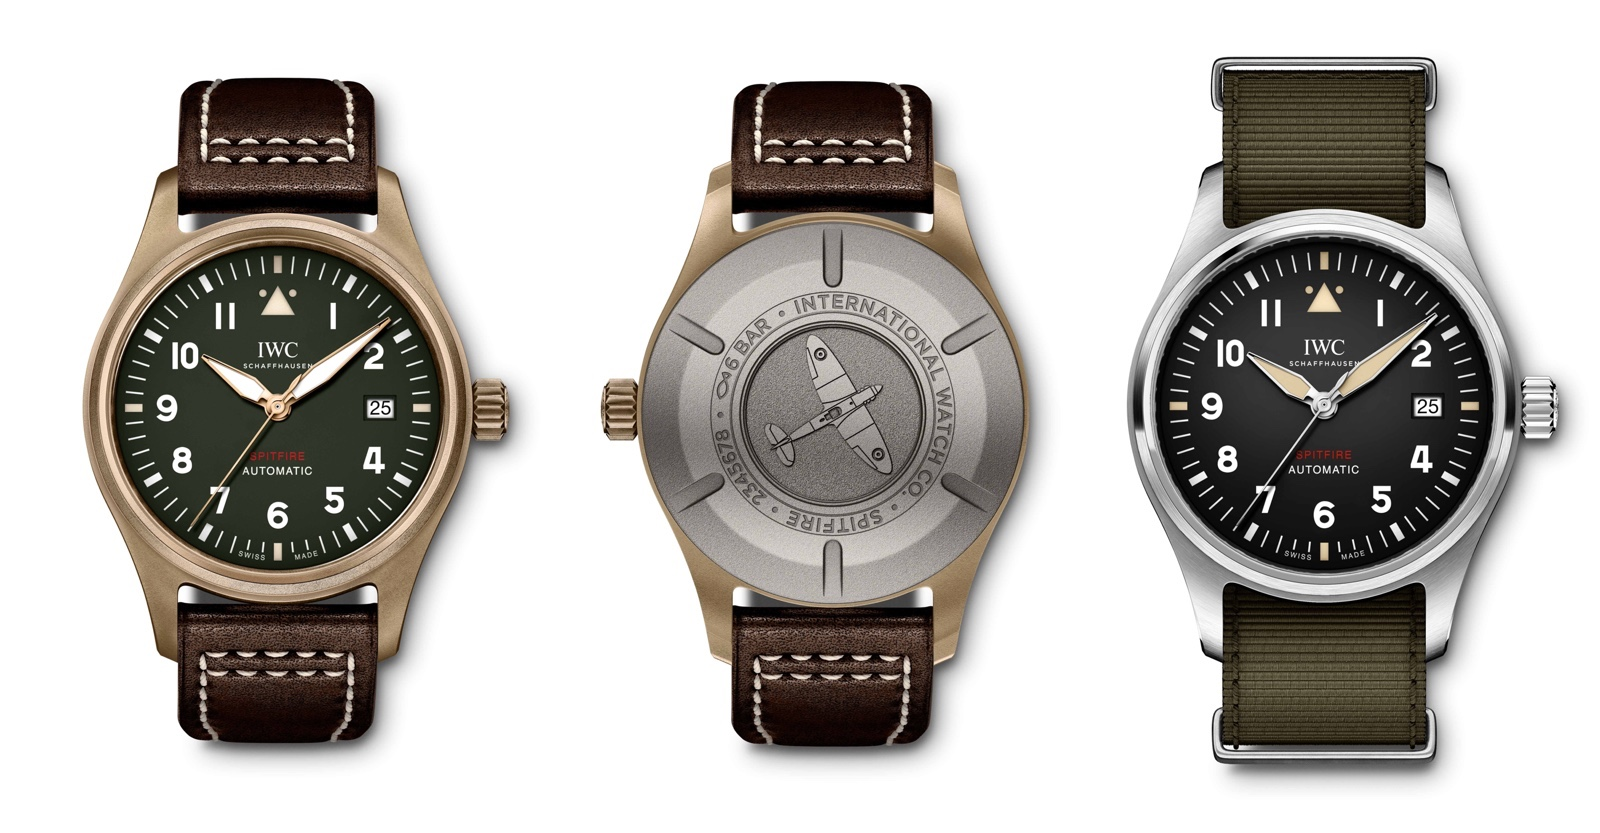 IWC-SIHH-2019-Reloj-de-Aviador-Automatic-Spitfire